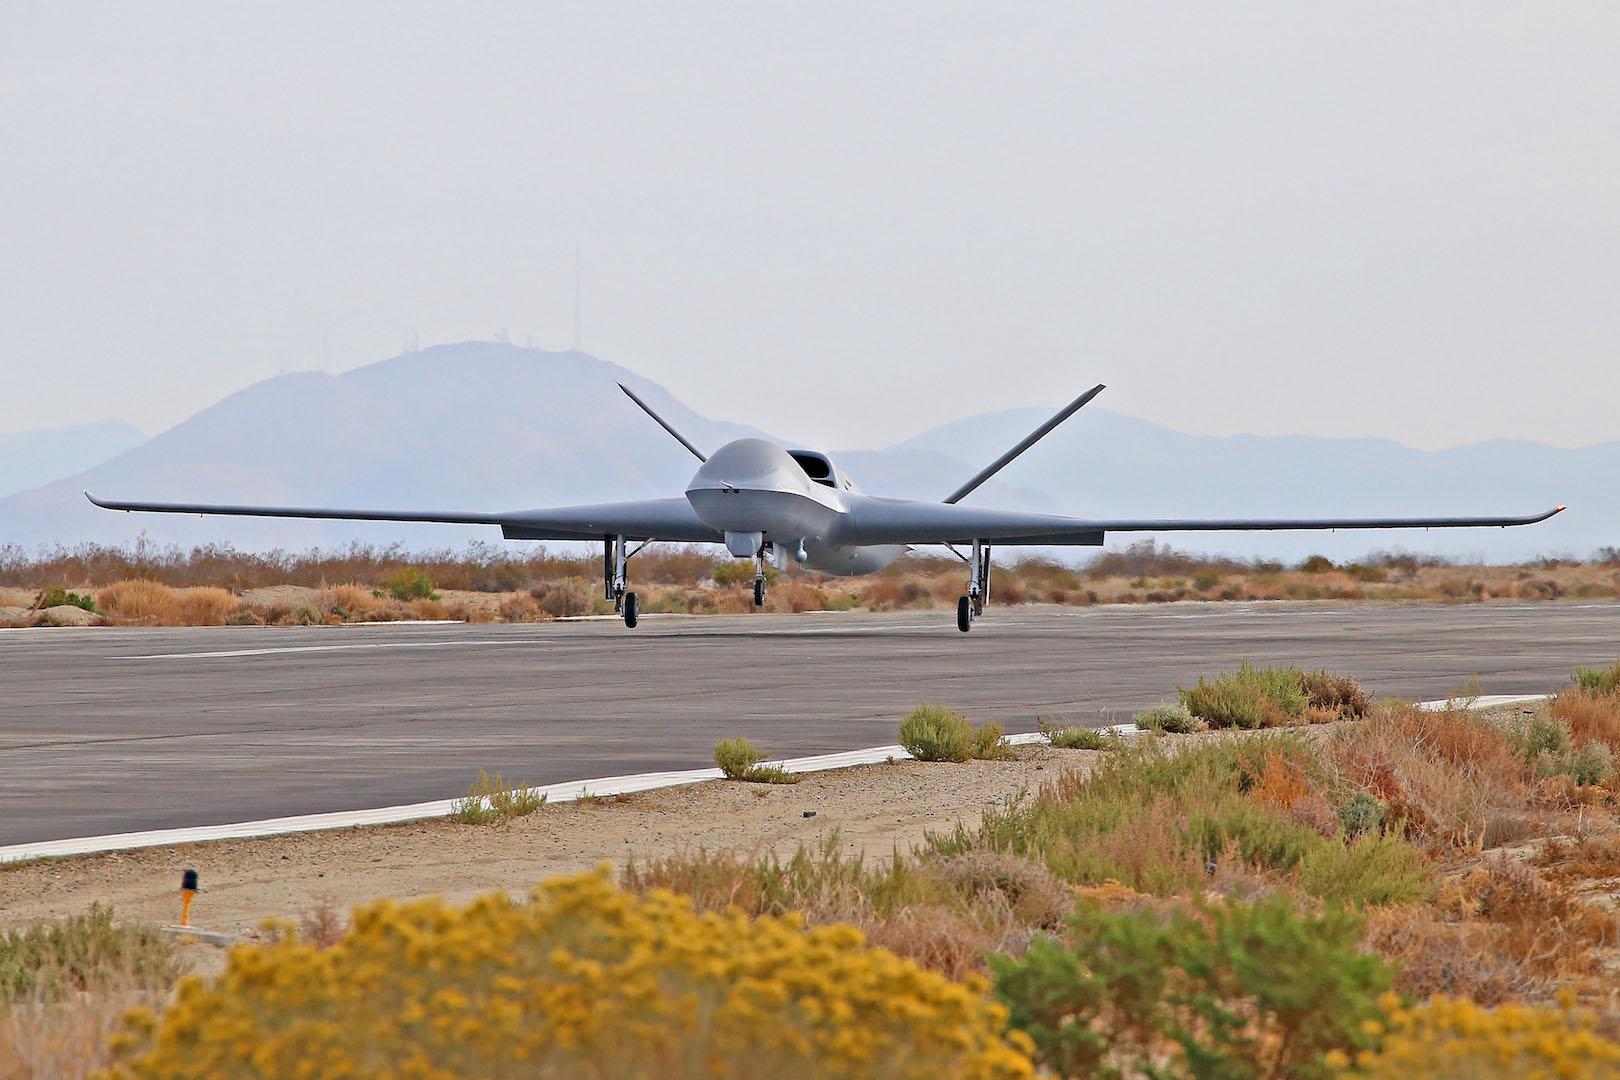 MQ-9B latest variant of MQ series armed drones